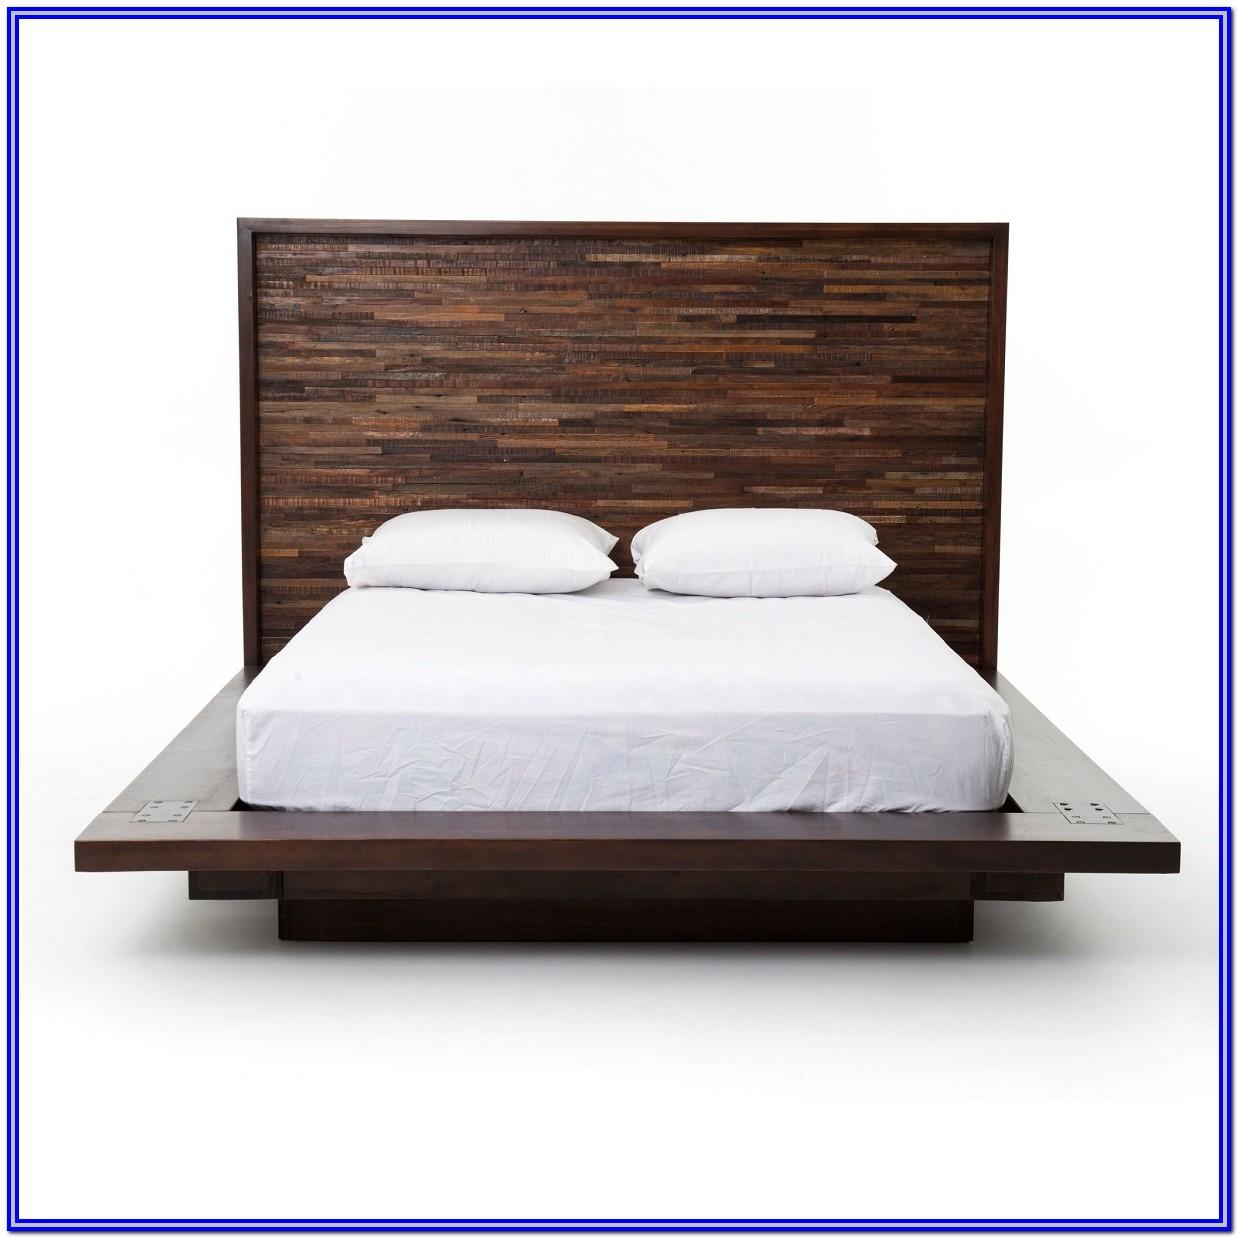 Wooden Platform Bed Frames Queen